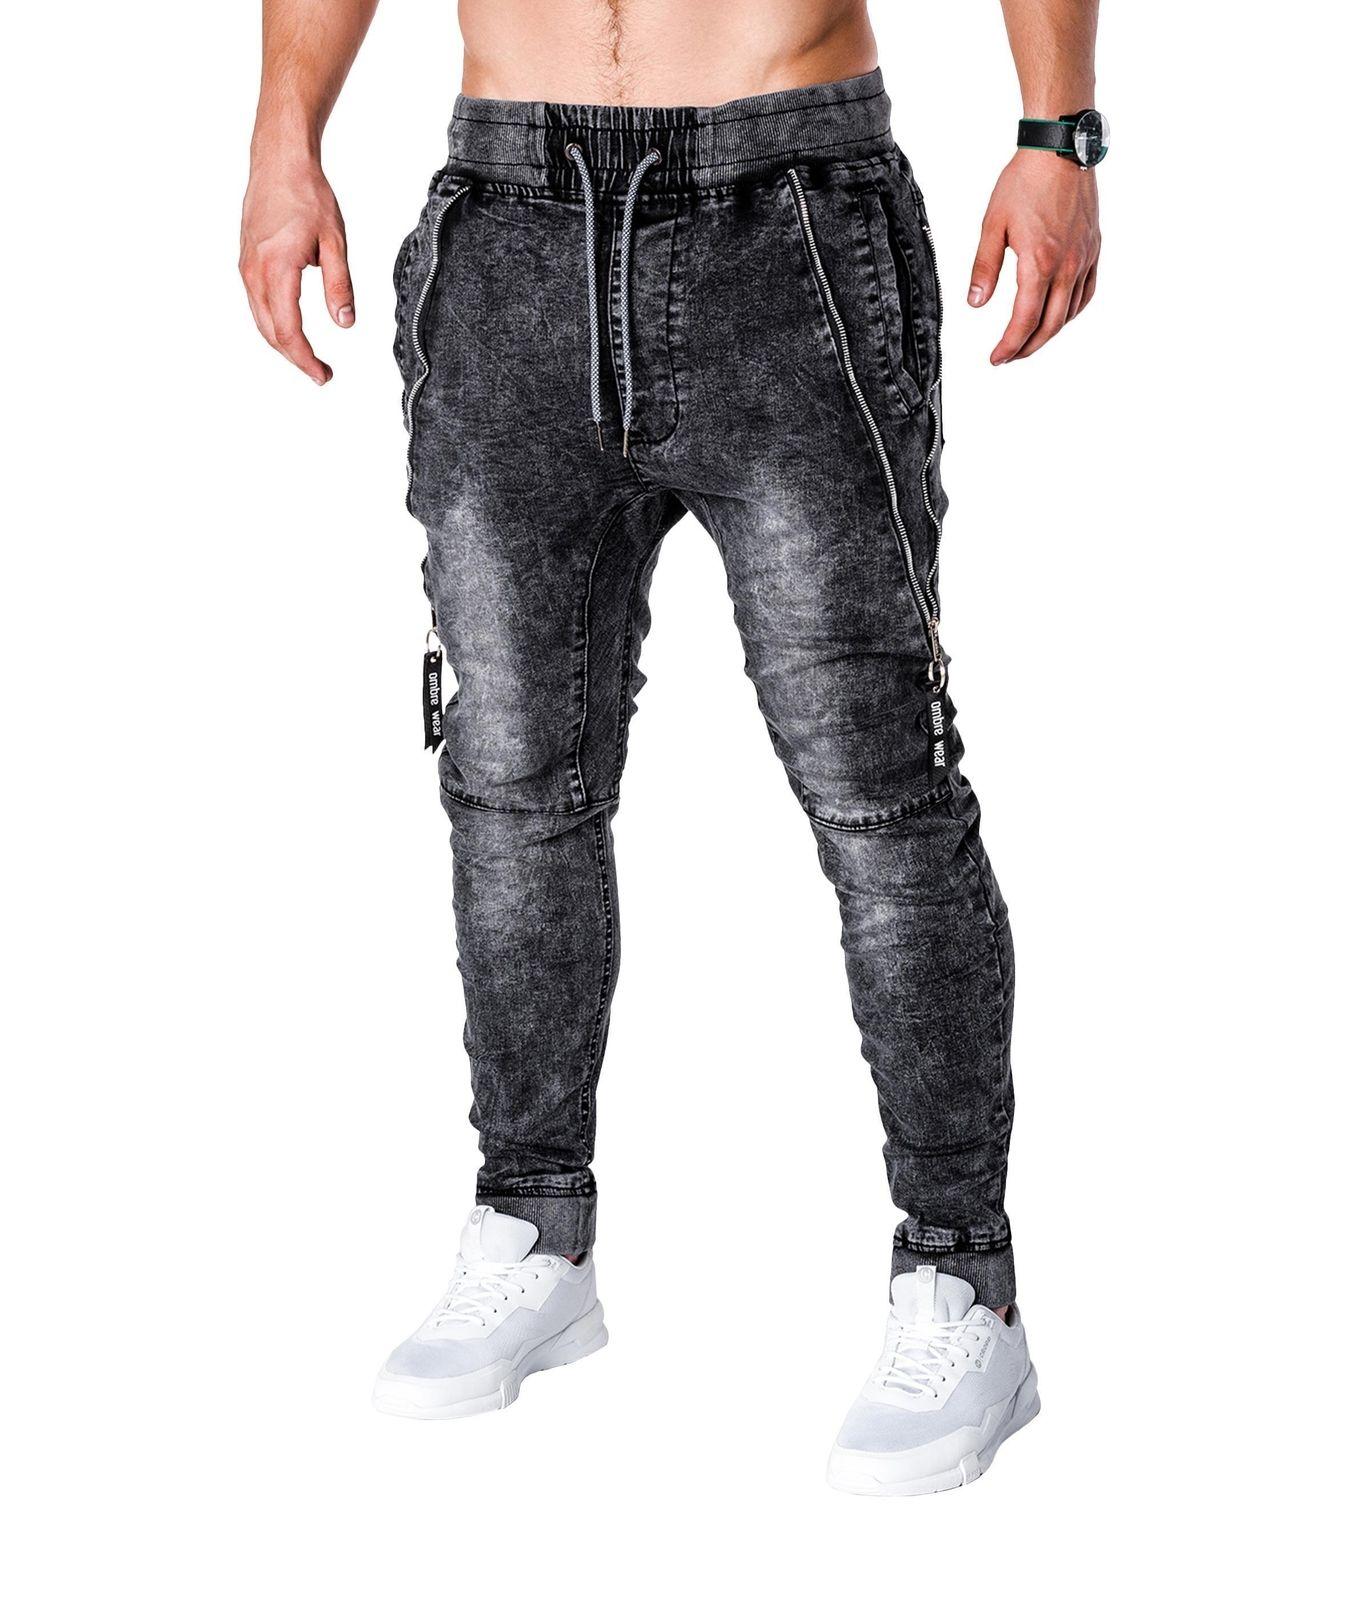 4e4e52d5ac4 Men Slim Fit Jogger Jeans  MST11Black – Online Shopping in Pakistan ...